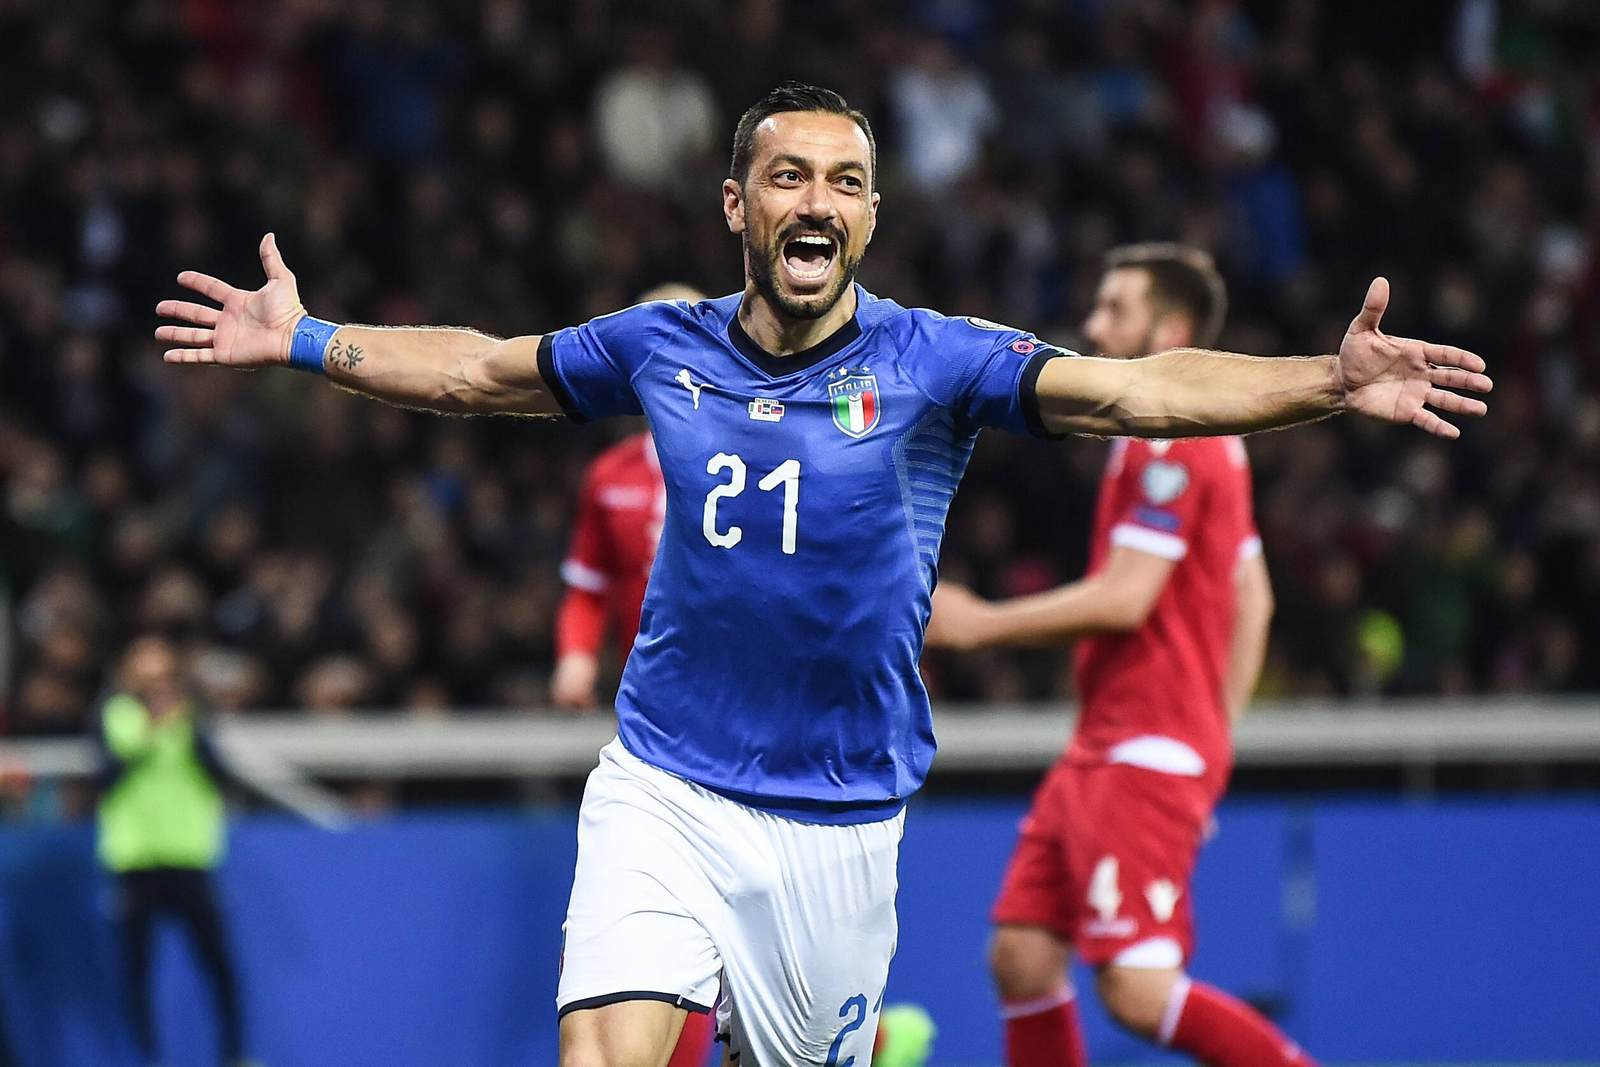 Fabio Quagliarella jubelt. Jetzt auf Griechenland gegen Italien wetten